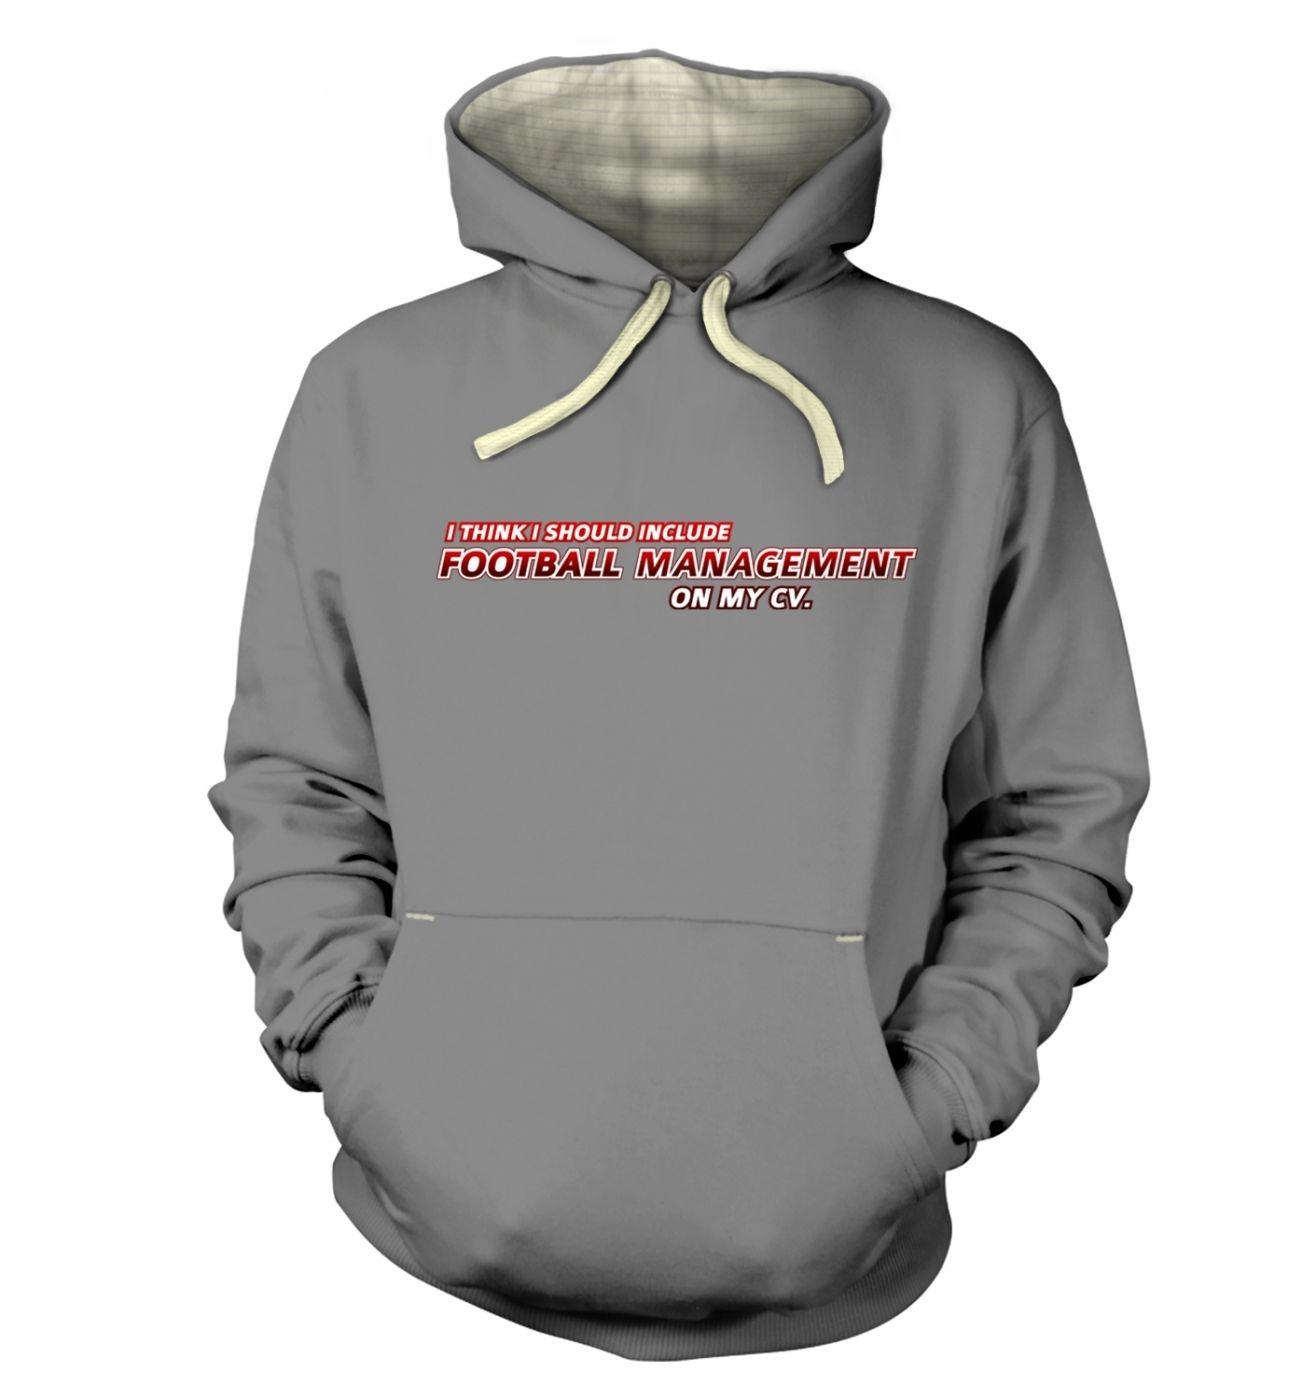 Football Management On CV premium hoodie